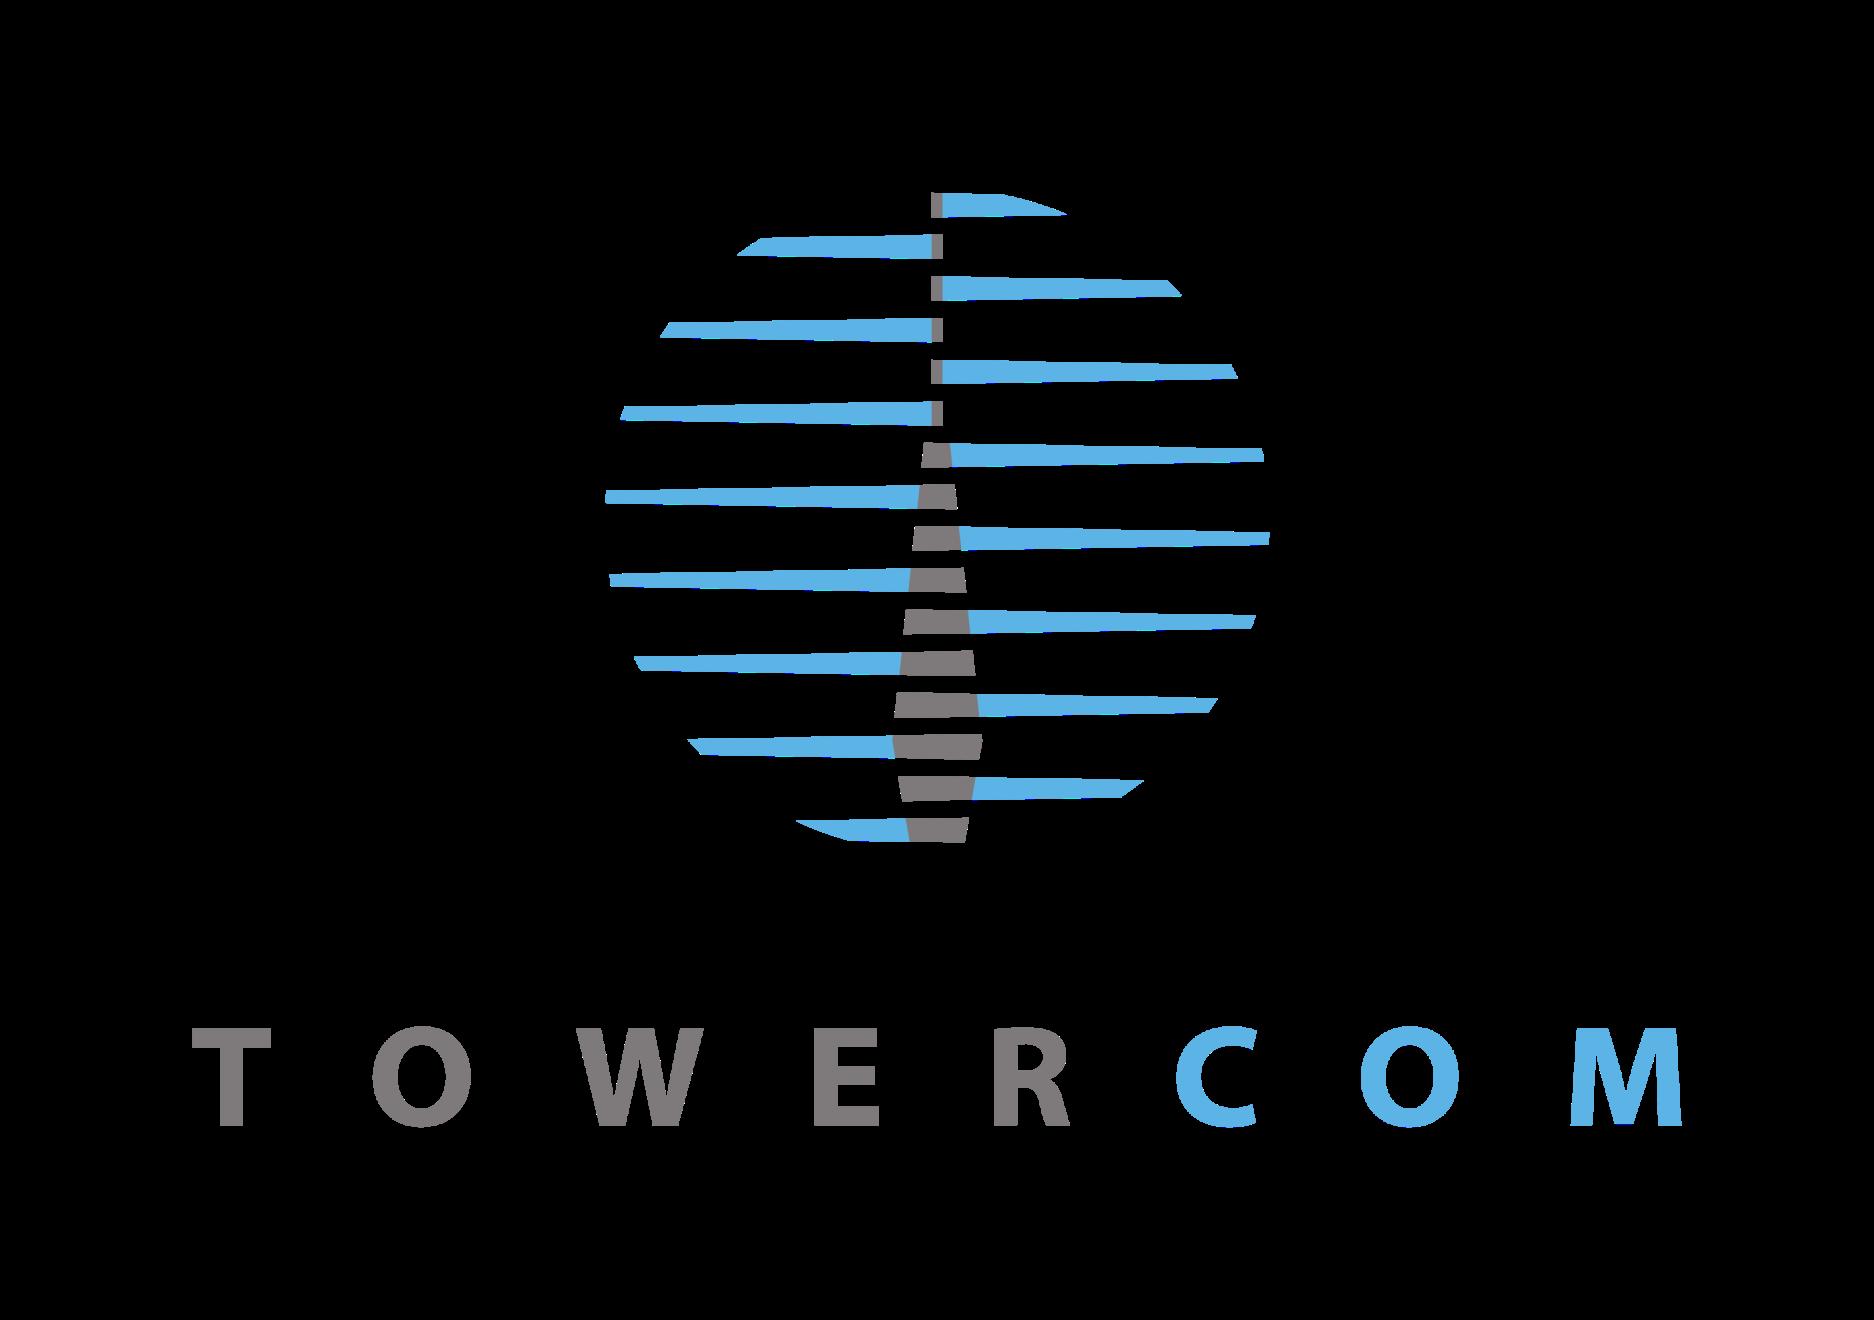 Towercom logo